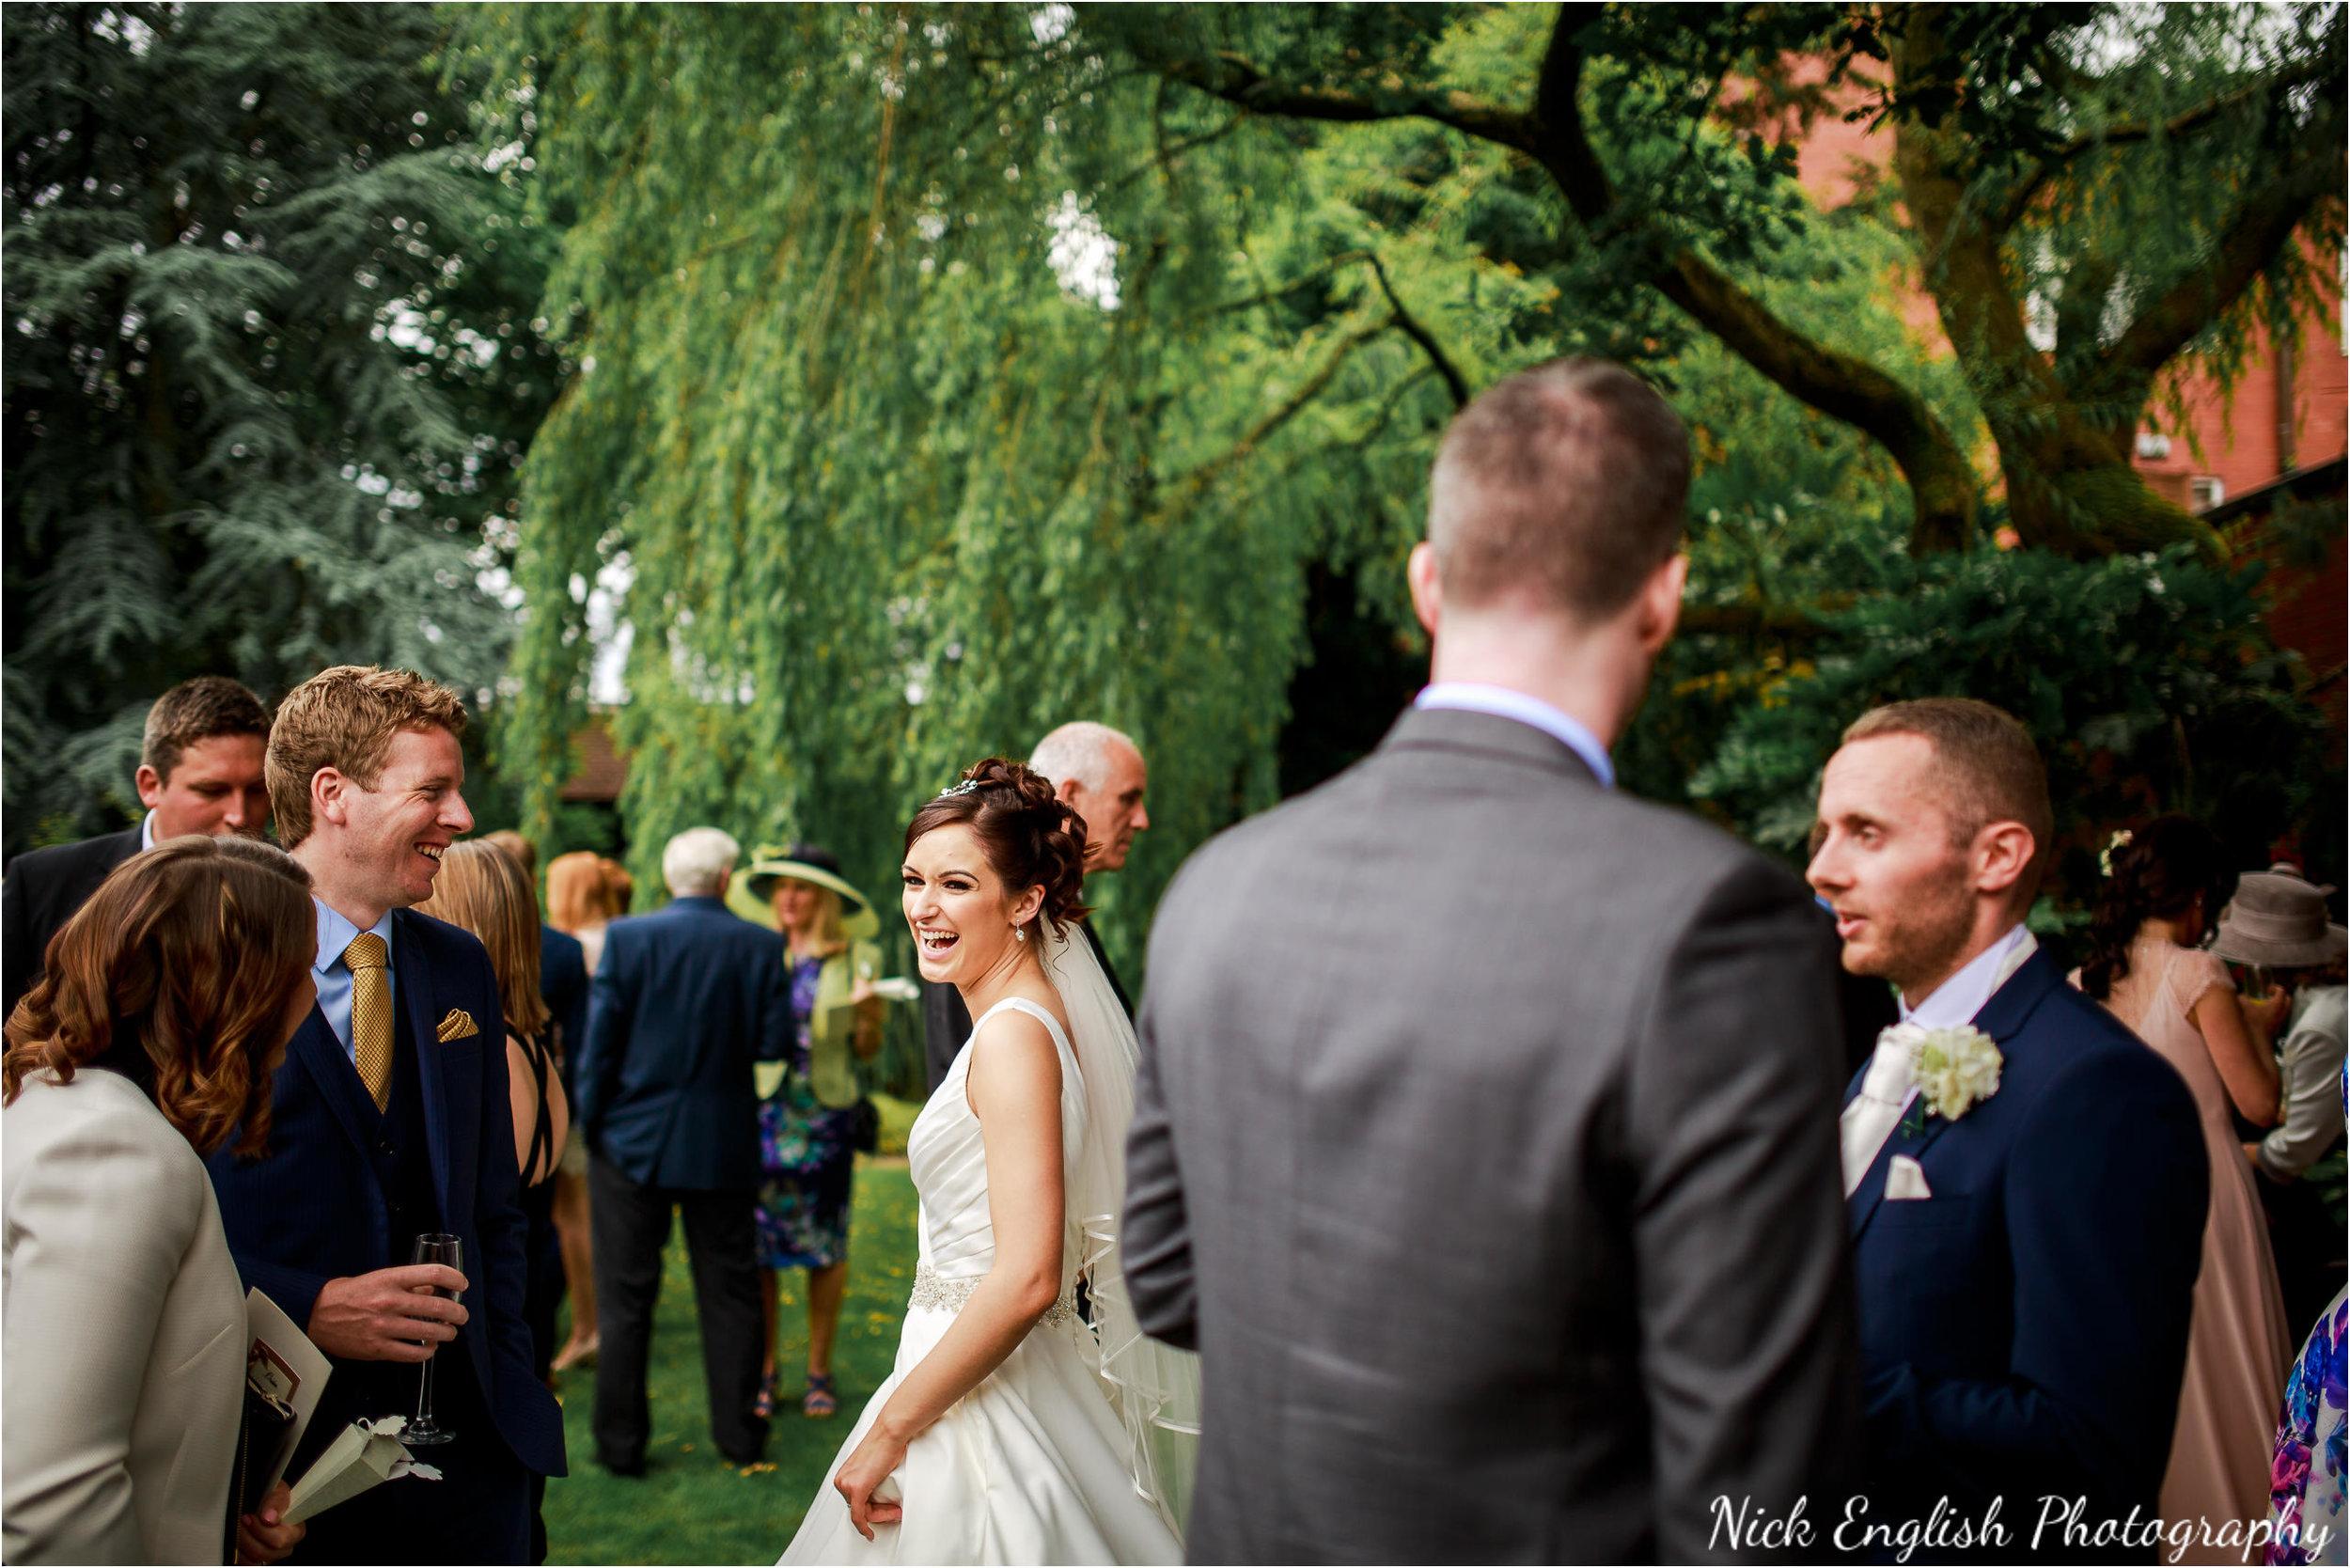 Emily David Wedding Photographs at Barton Grange Preston by Nick English Photography 127jpg.jpeg